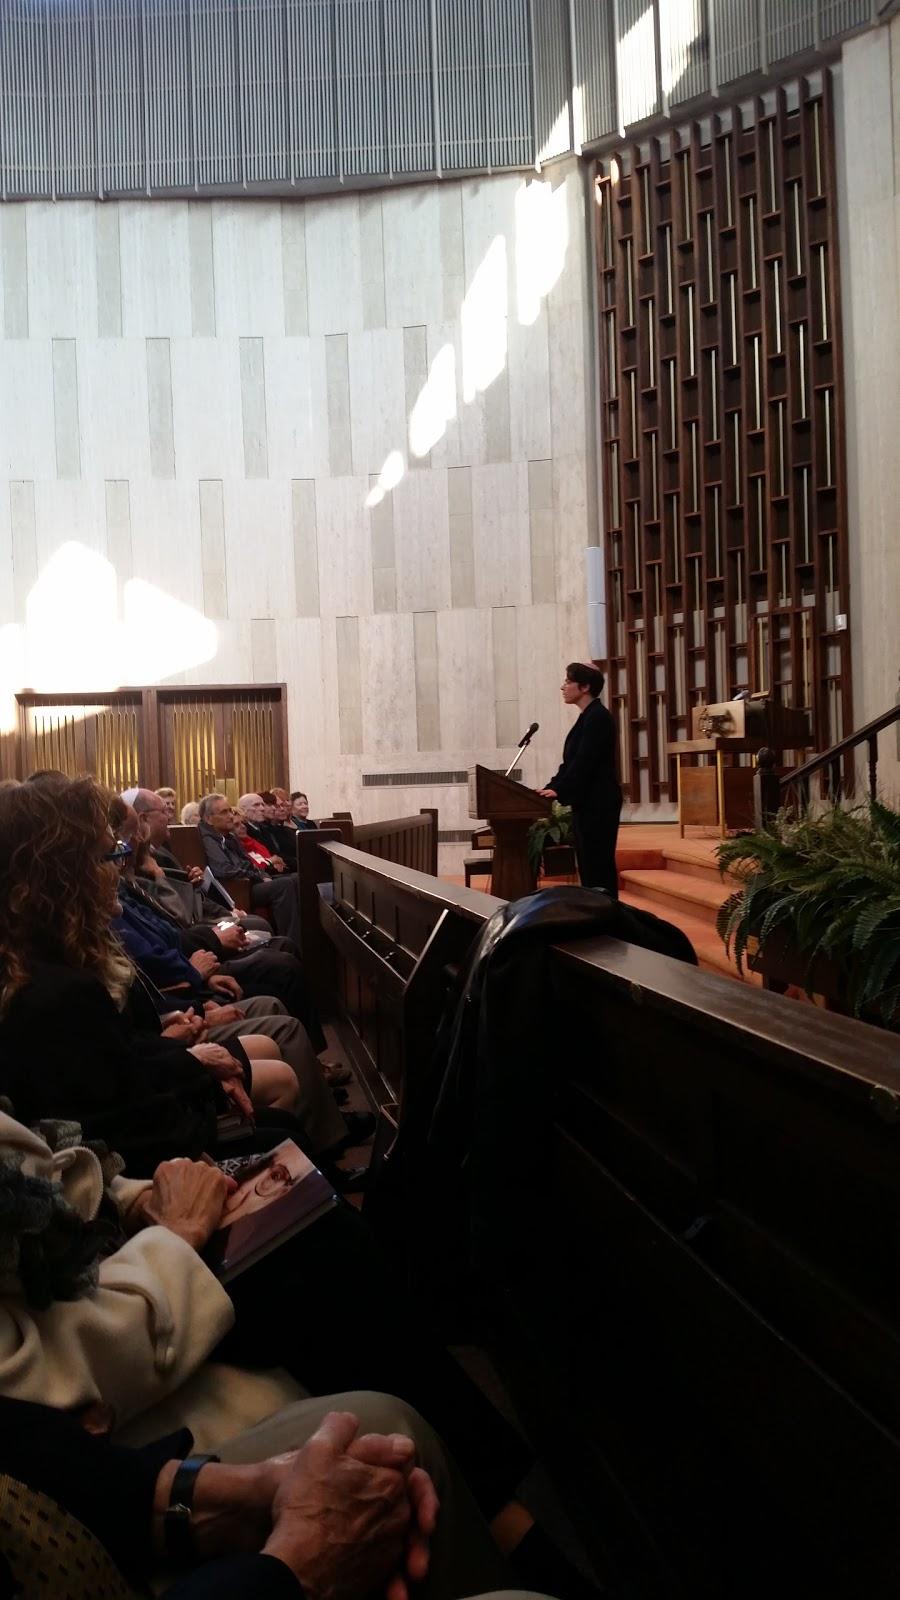 Temple Emanu-El-Beth Sholom | synagogue | 4100, rue Sherbrooke O, Westmount, QC H3Z 1A5, Canada | 5149373575 OR +1 514-937-3575